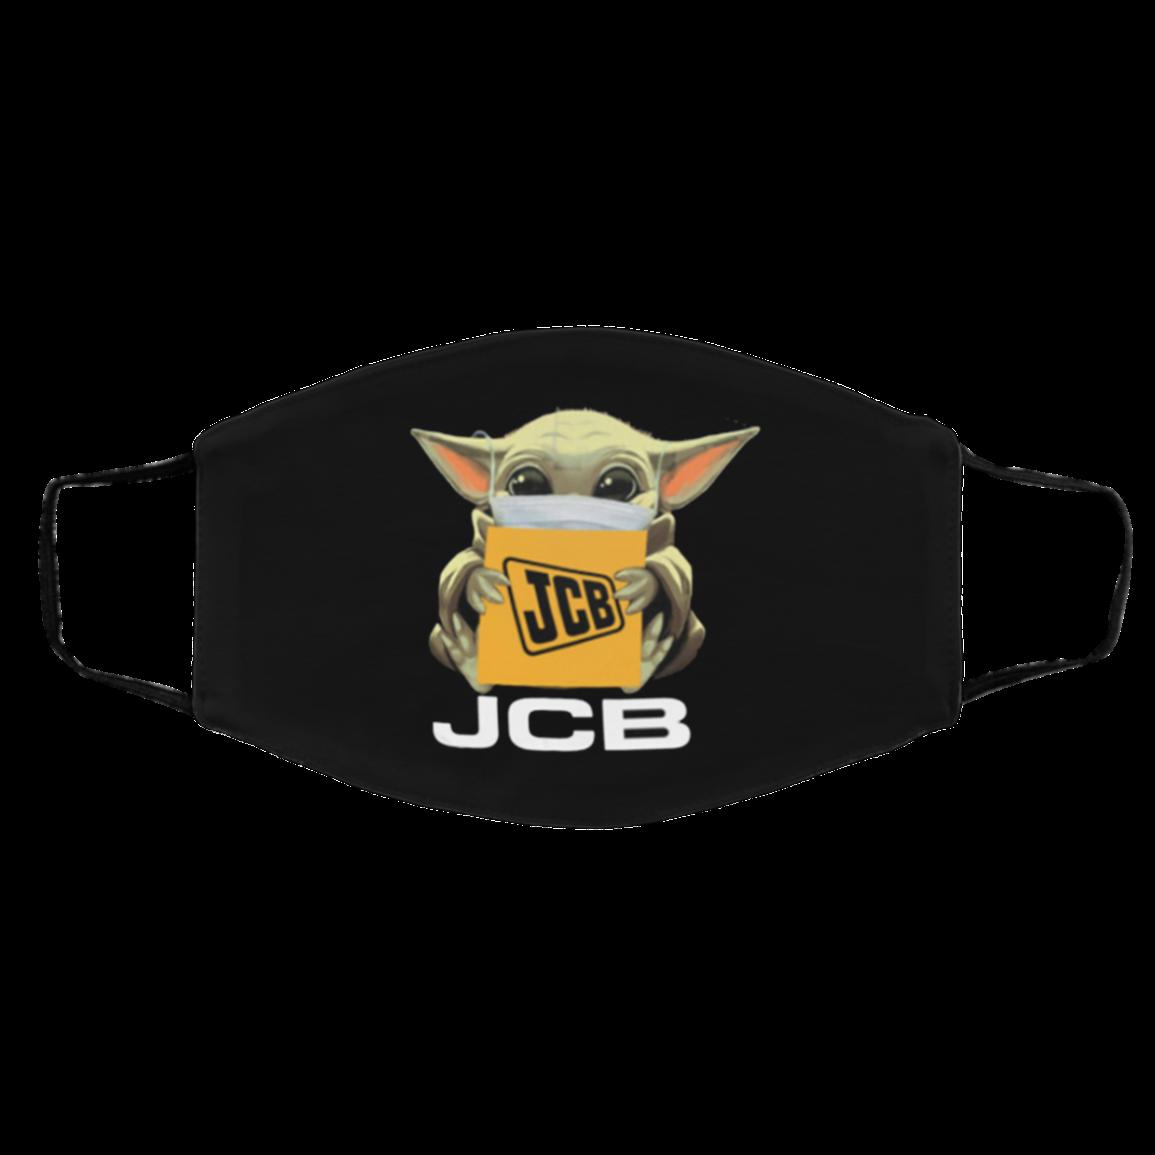 B-aby Yod-a J-C-B Cotton Face Mask